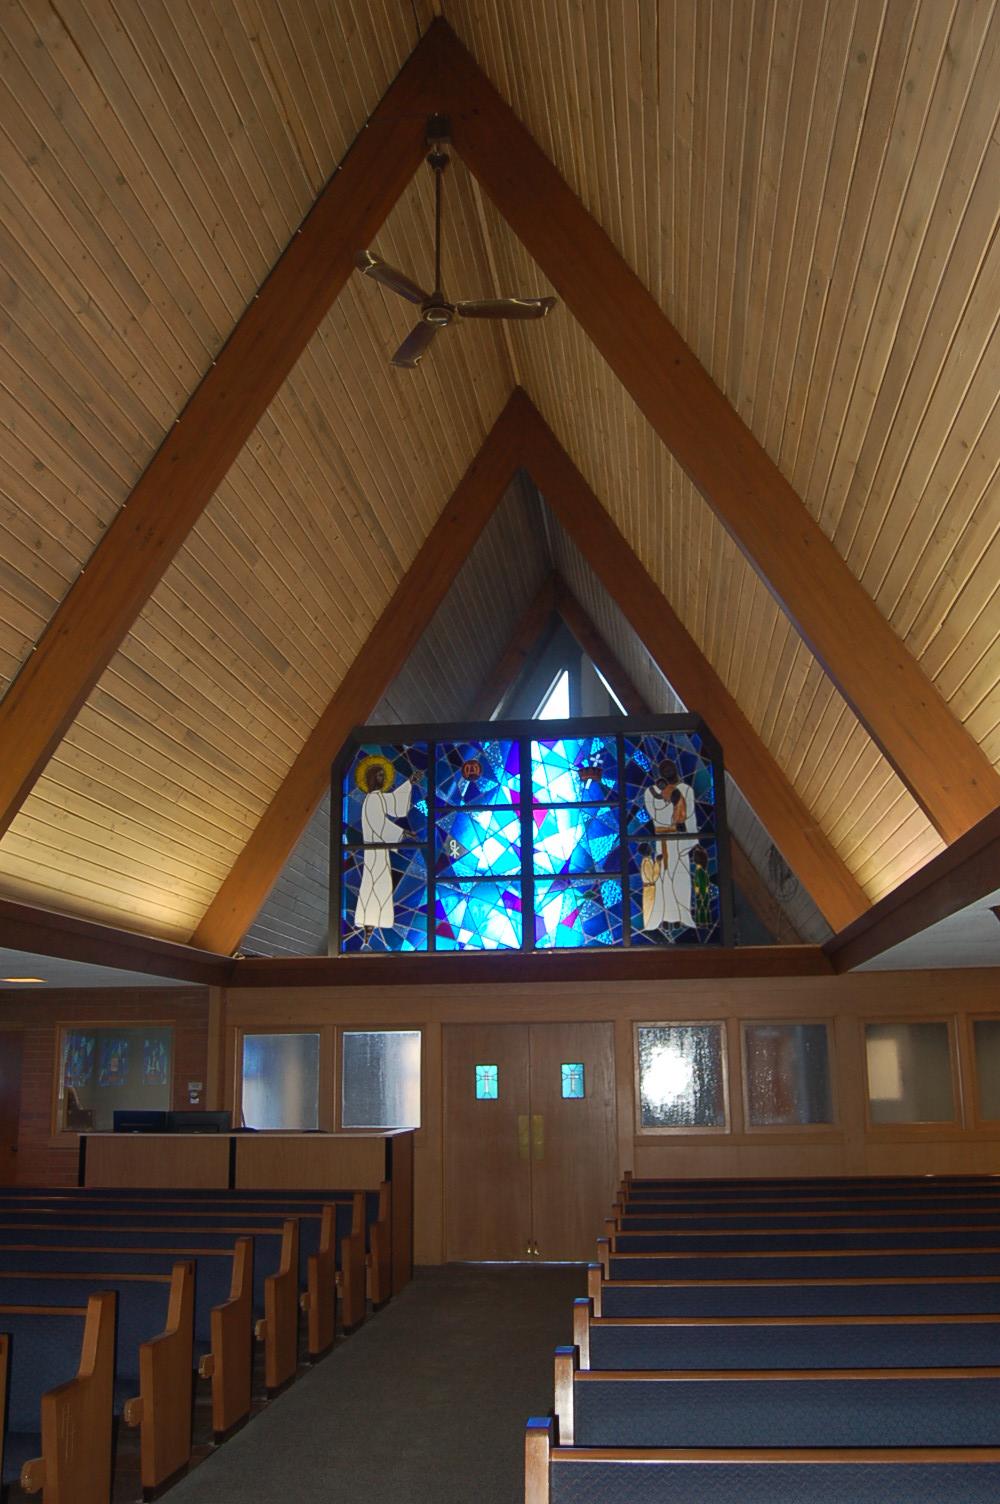 North Sewickley Presbyterian Church (stained glass interior)